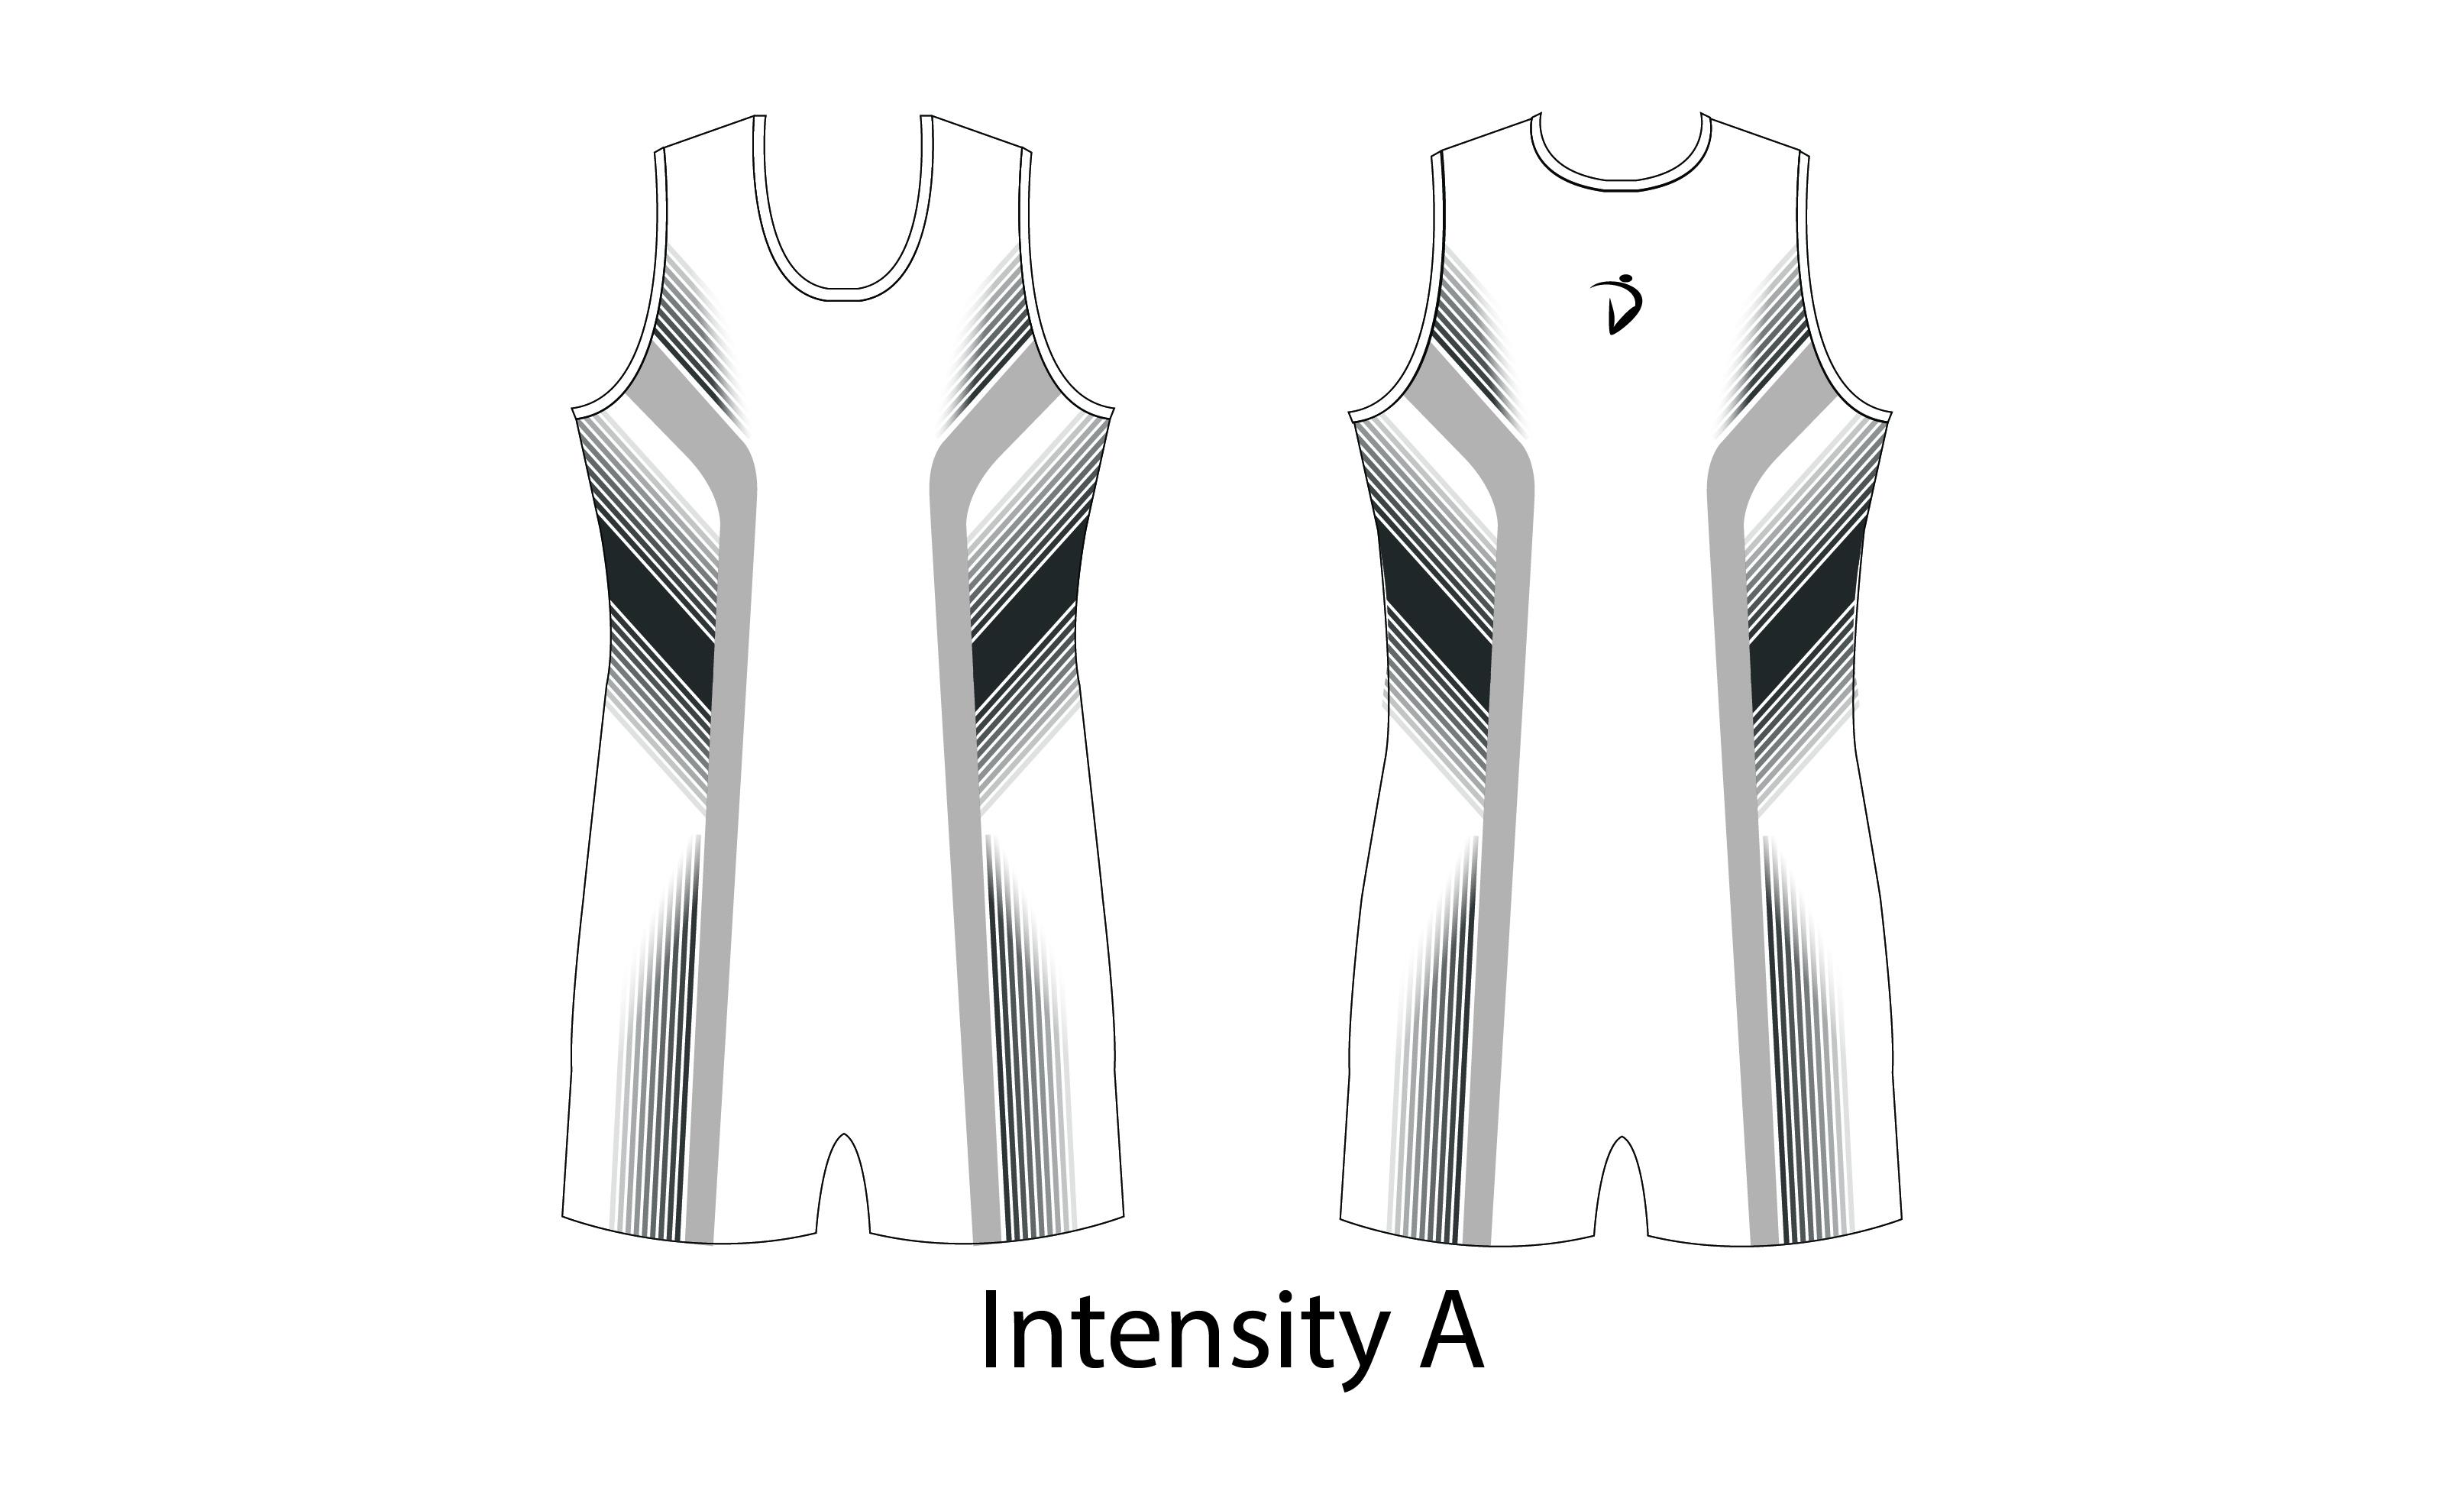 Intensity A